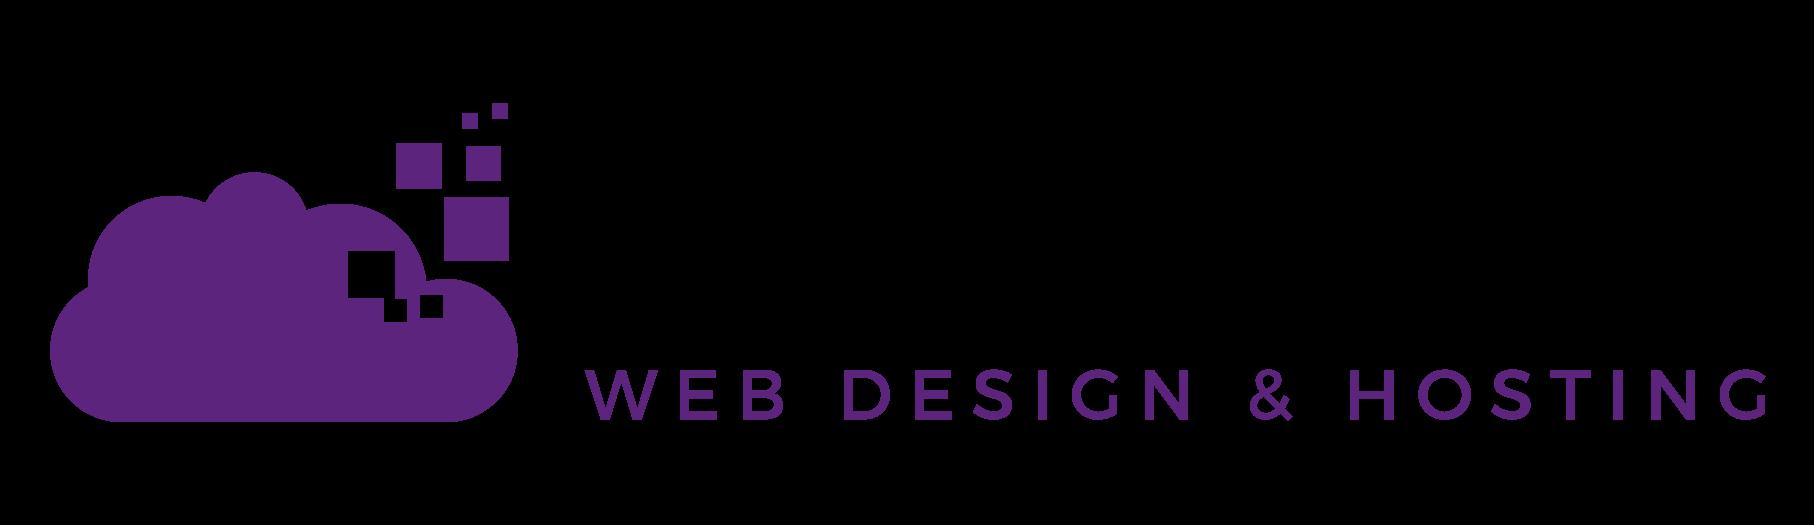 JBEECHII Web Hosting